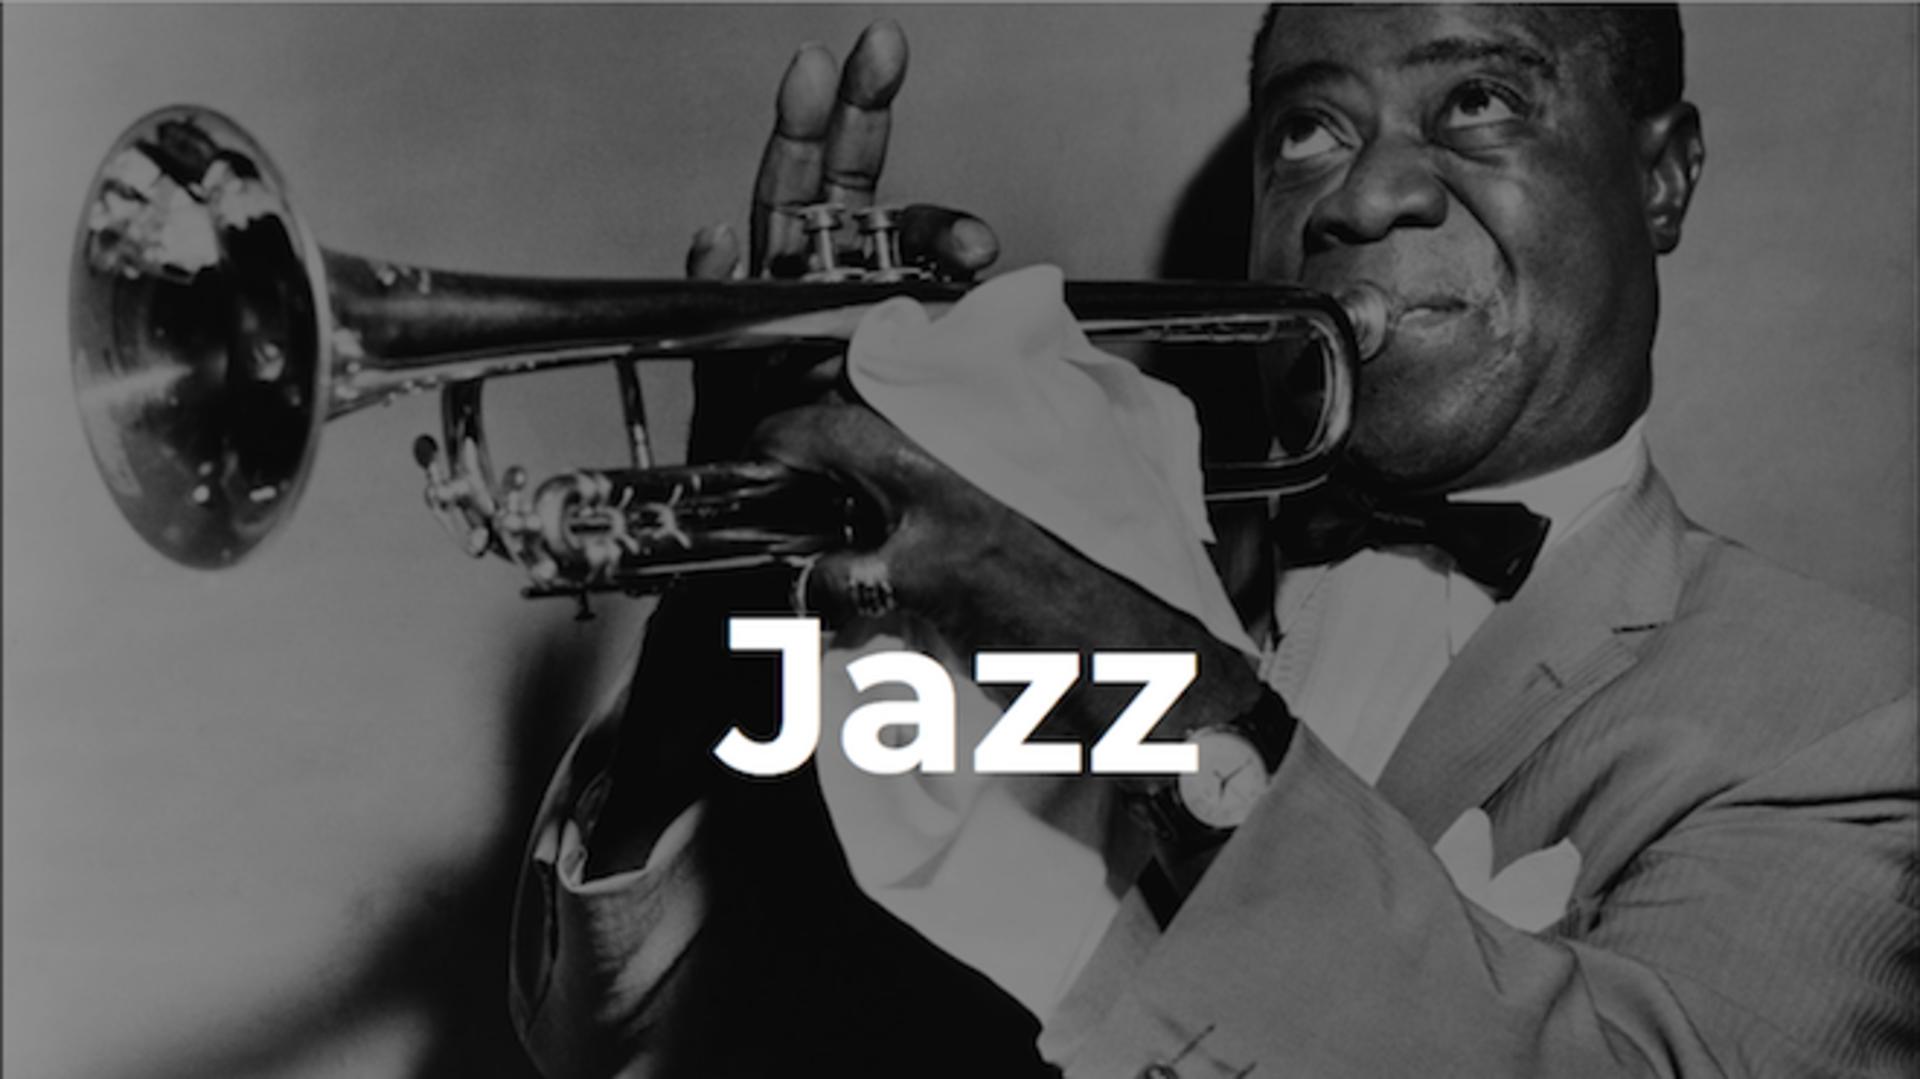 Les jazz